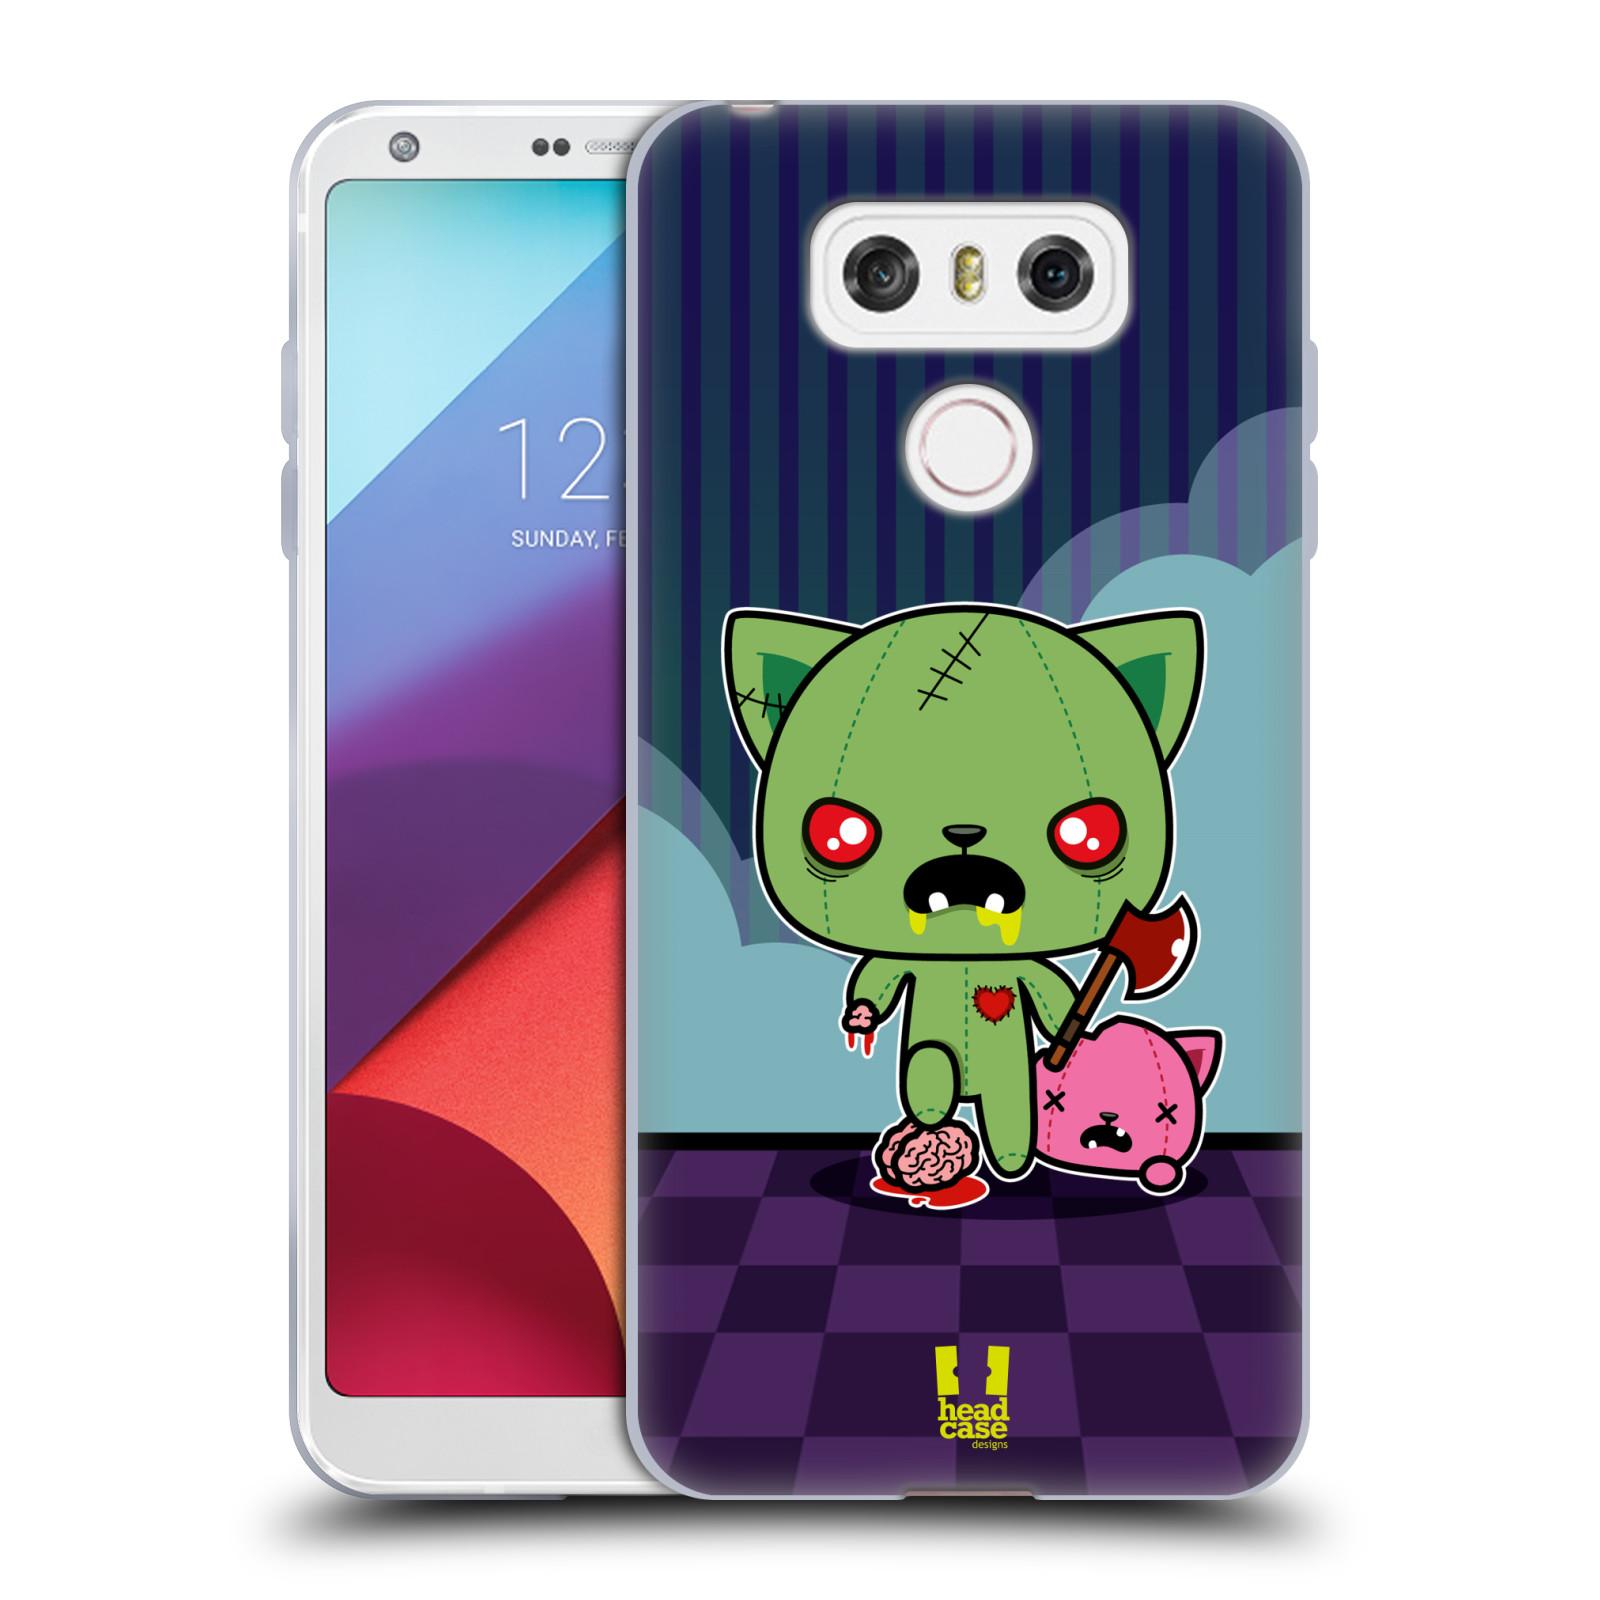 Silikonové pouzdro na mobil LG G6 - Head Case ZOMBIE KOČIČKA (Silikonový kryt či obal na mobilní telefon LG G6 H870 / LG G6 Dual SIM H870DS)